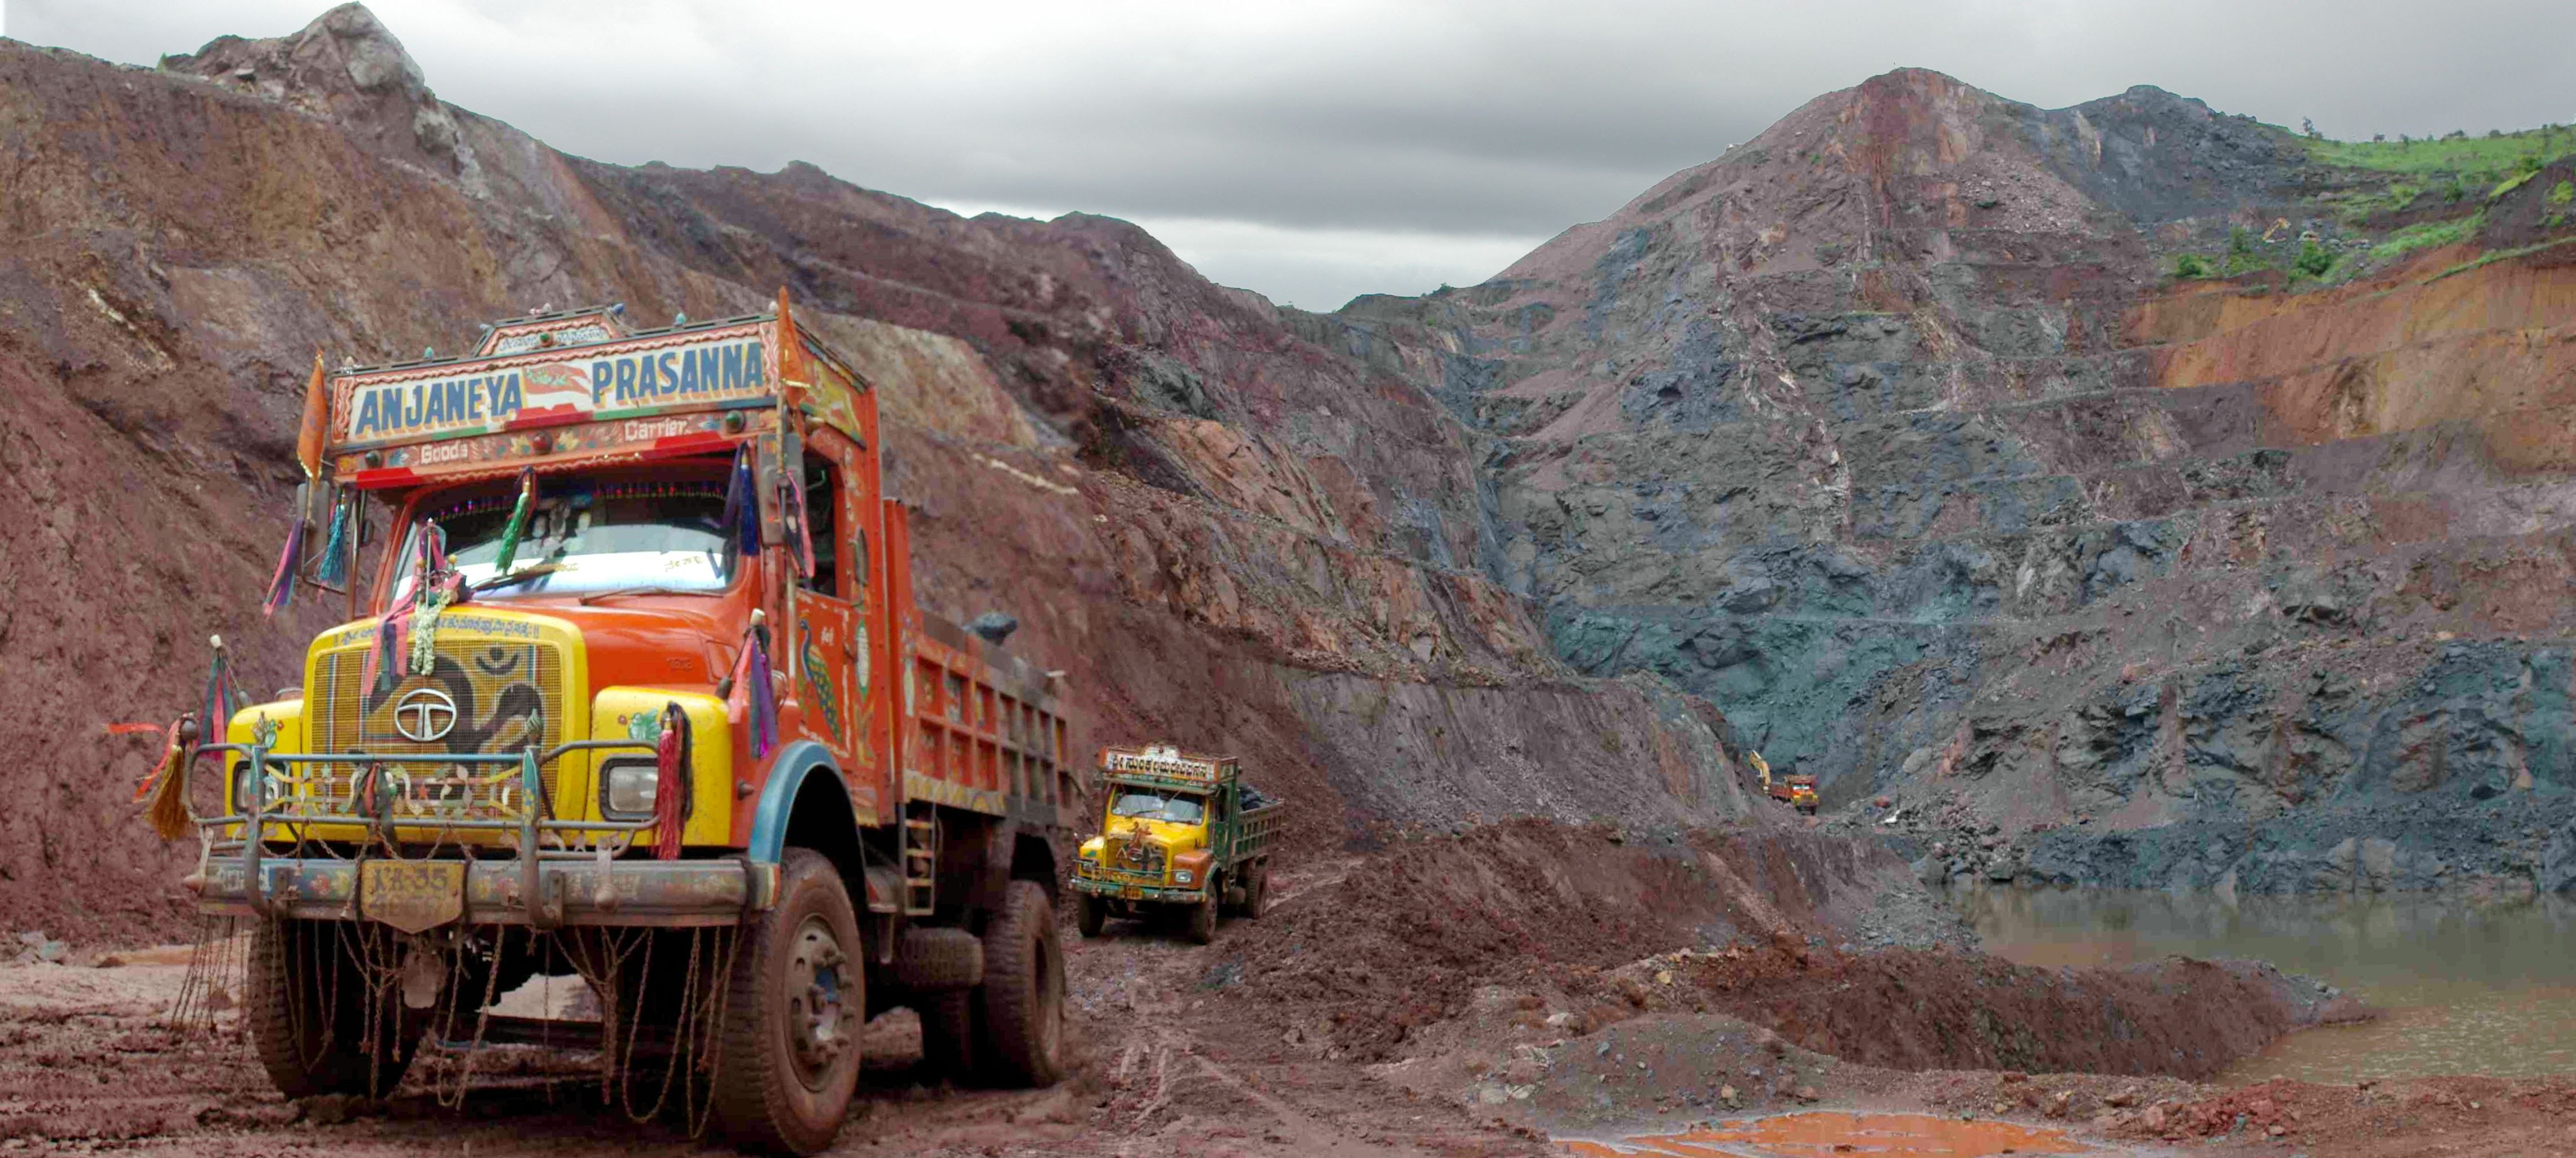 Iron ore mining in Karnataka state. India Iron ore